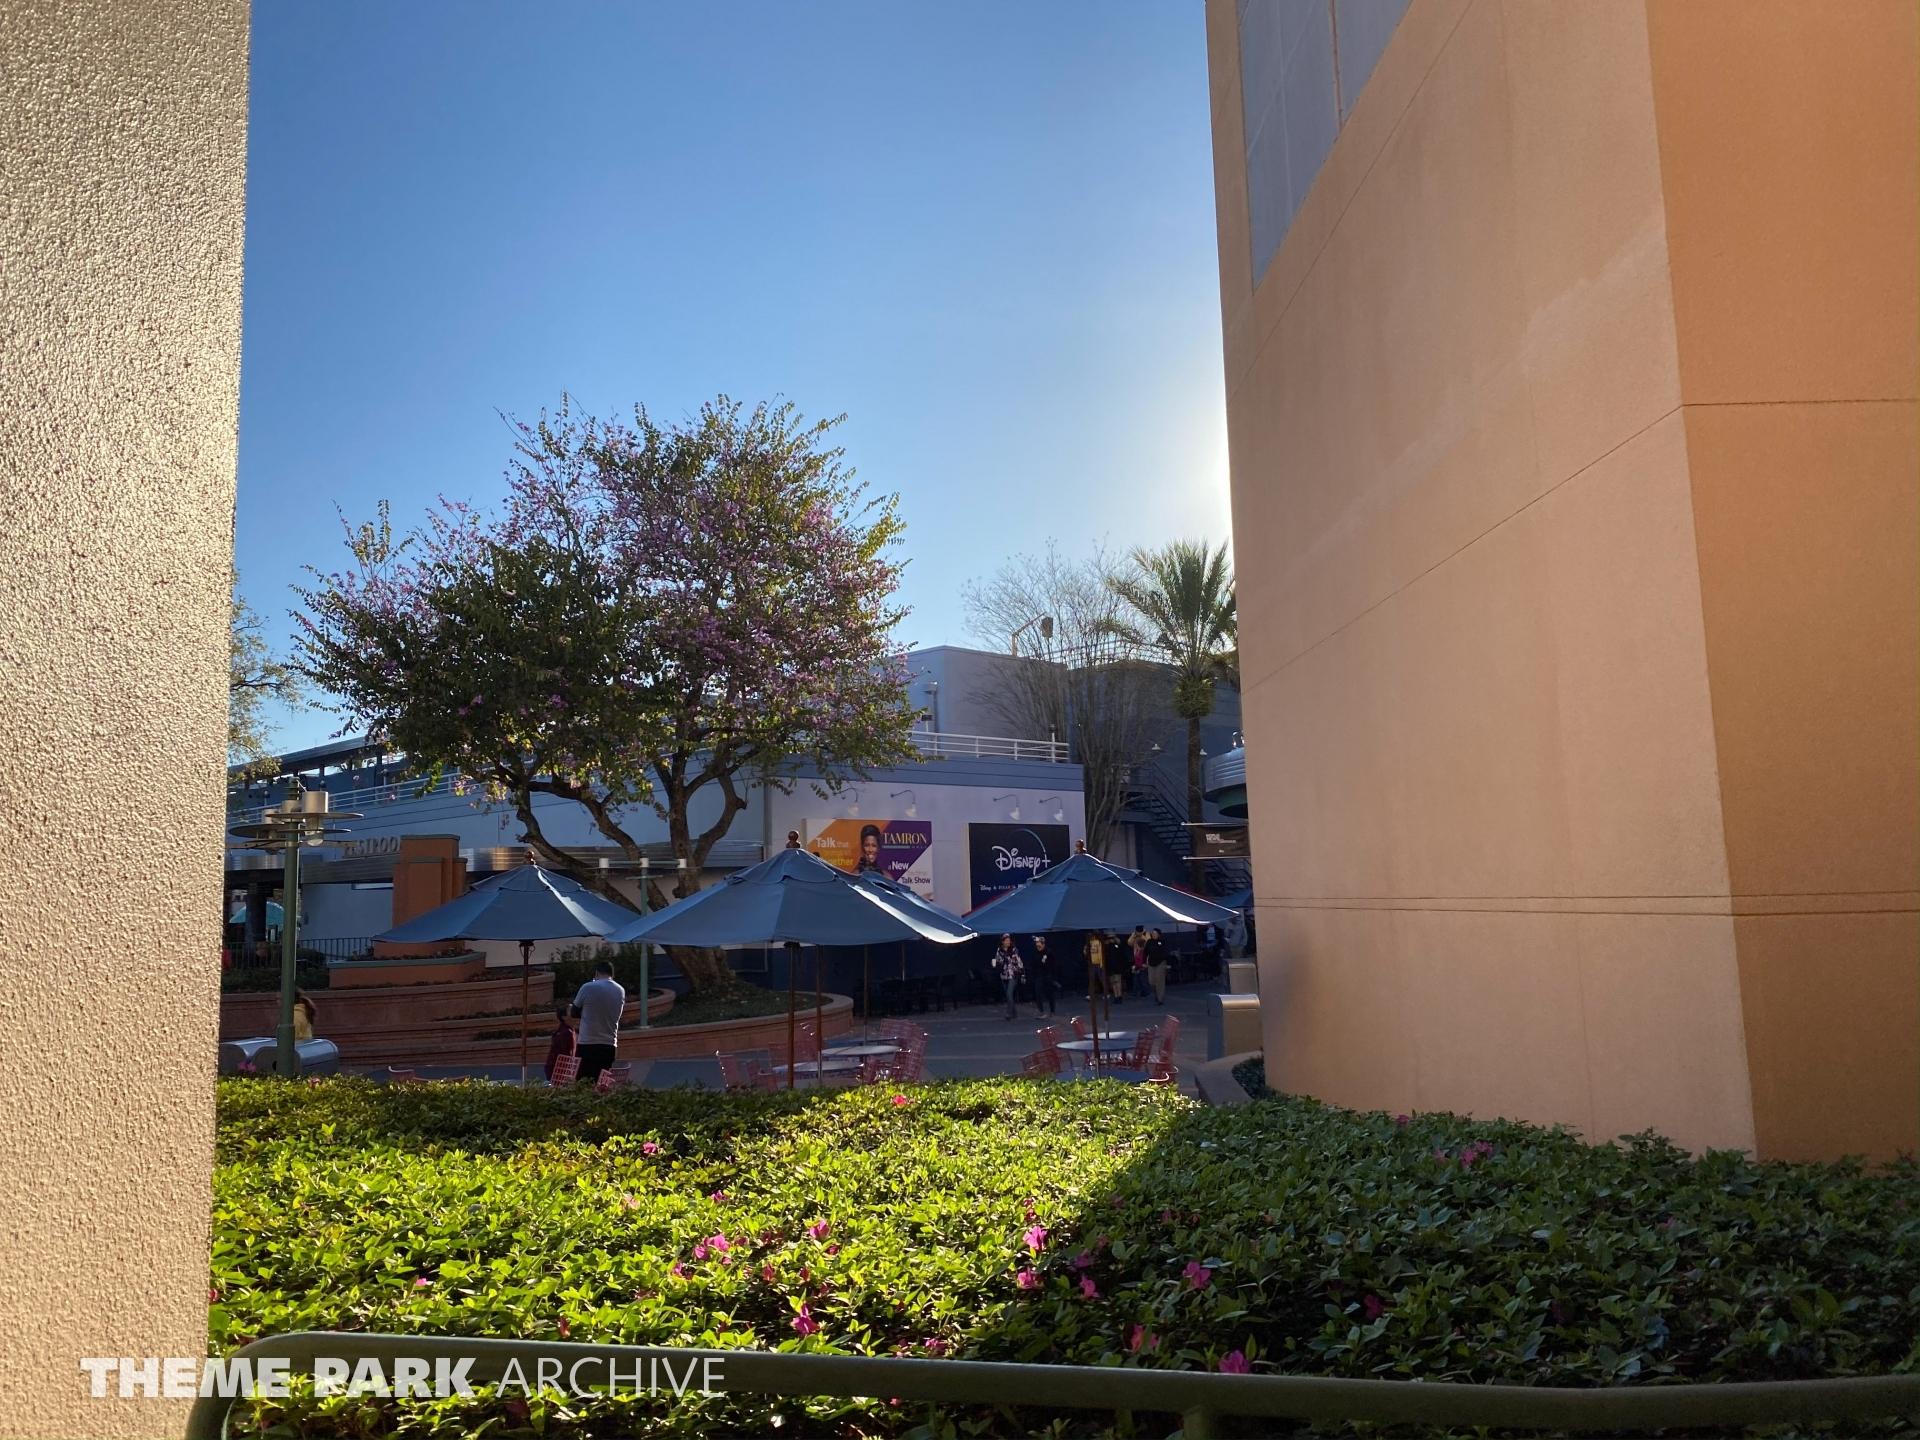 Commissary Lane at Disney's Hollywood Studios